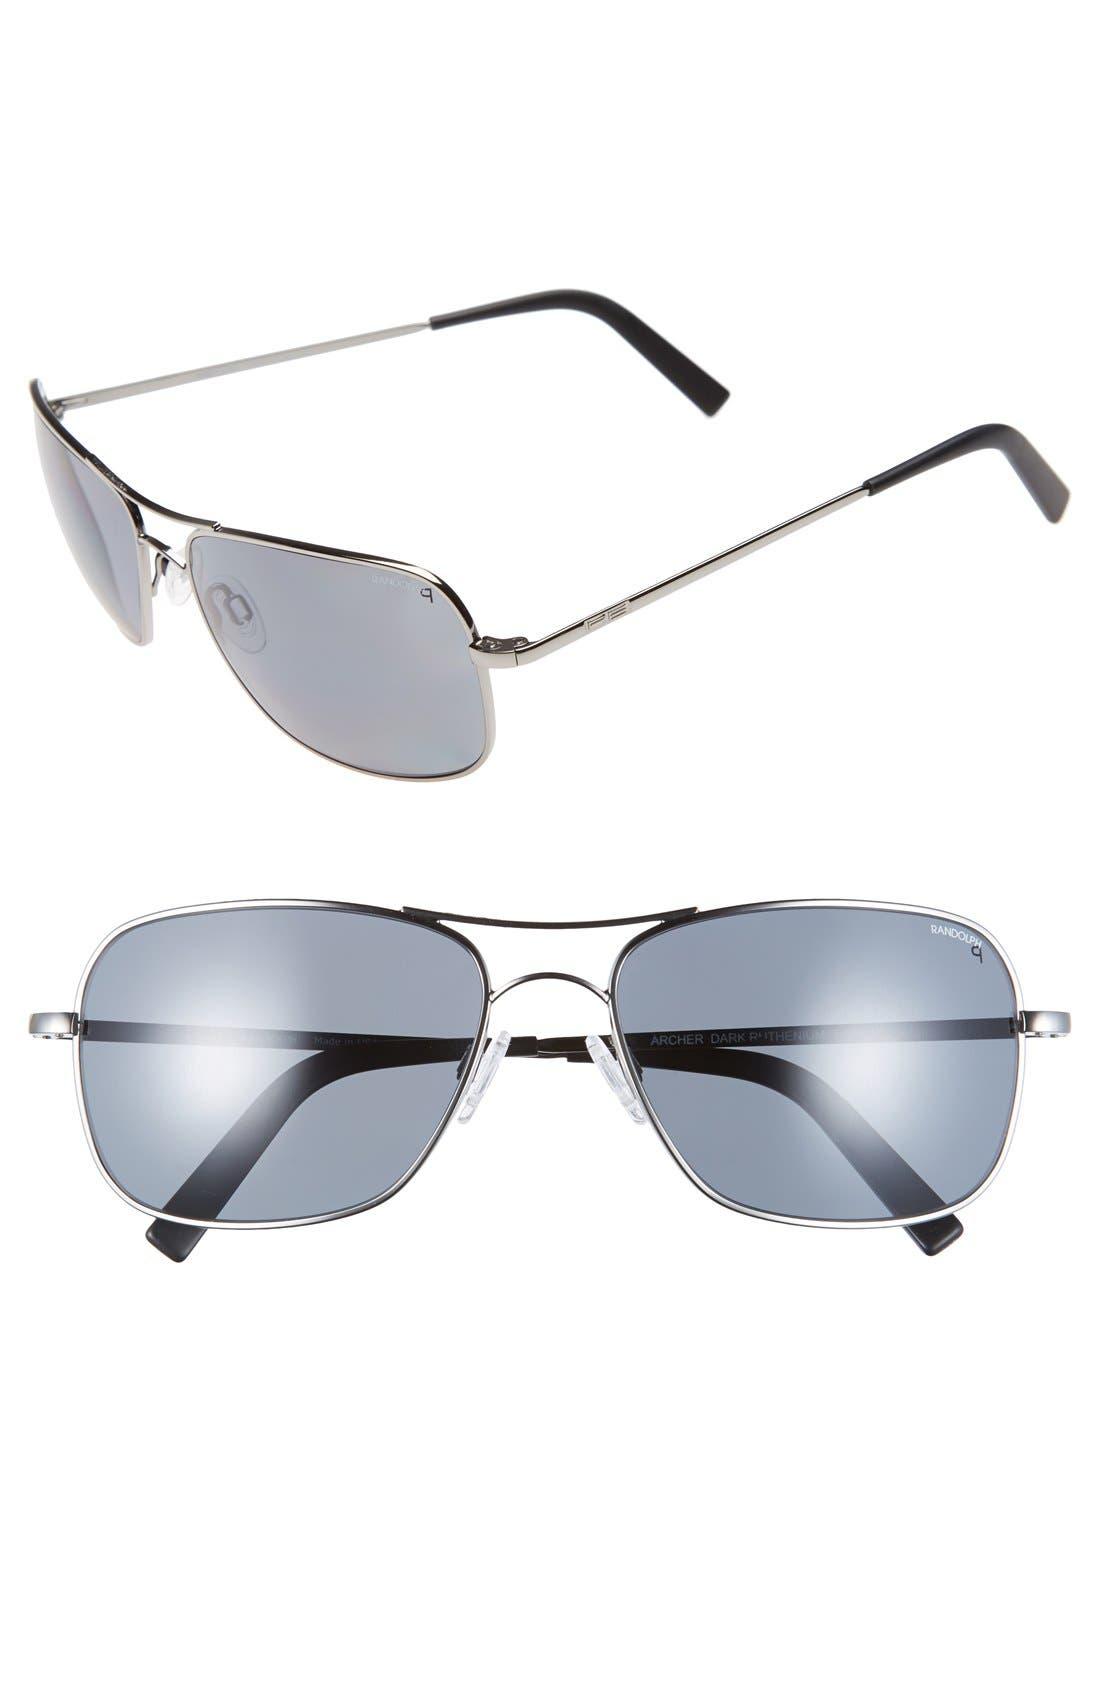 Alternate Image 1 Selected - Randolph Engineering 'Archer' 59mm Polarized Sunglasses